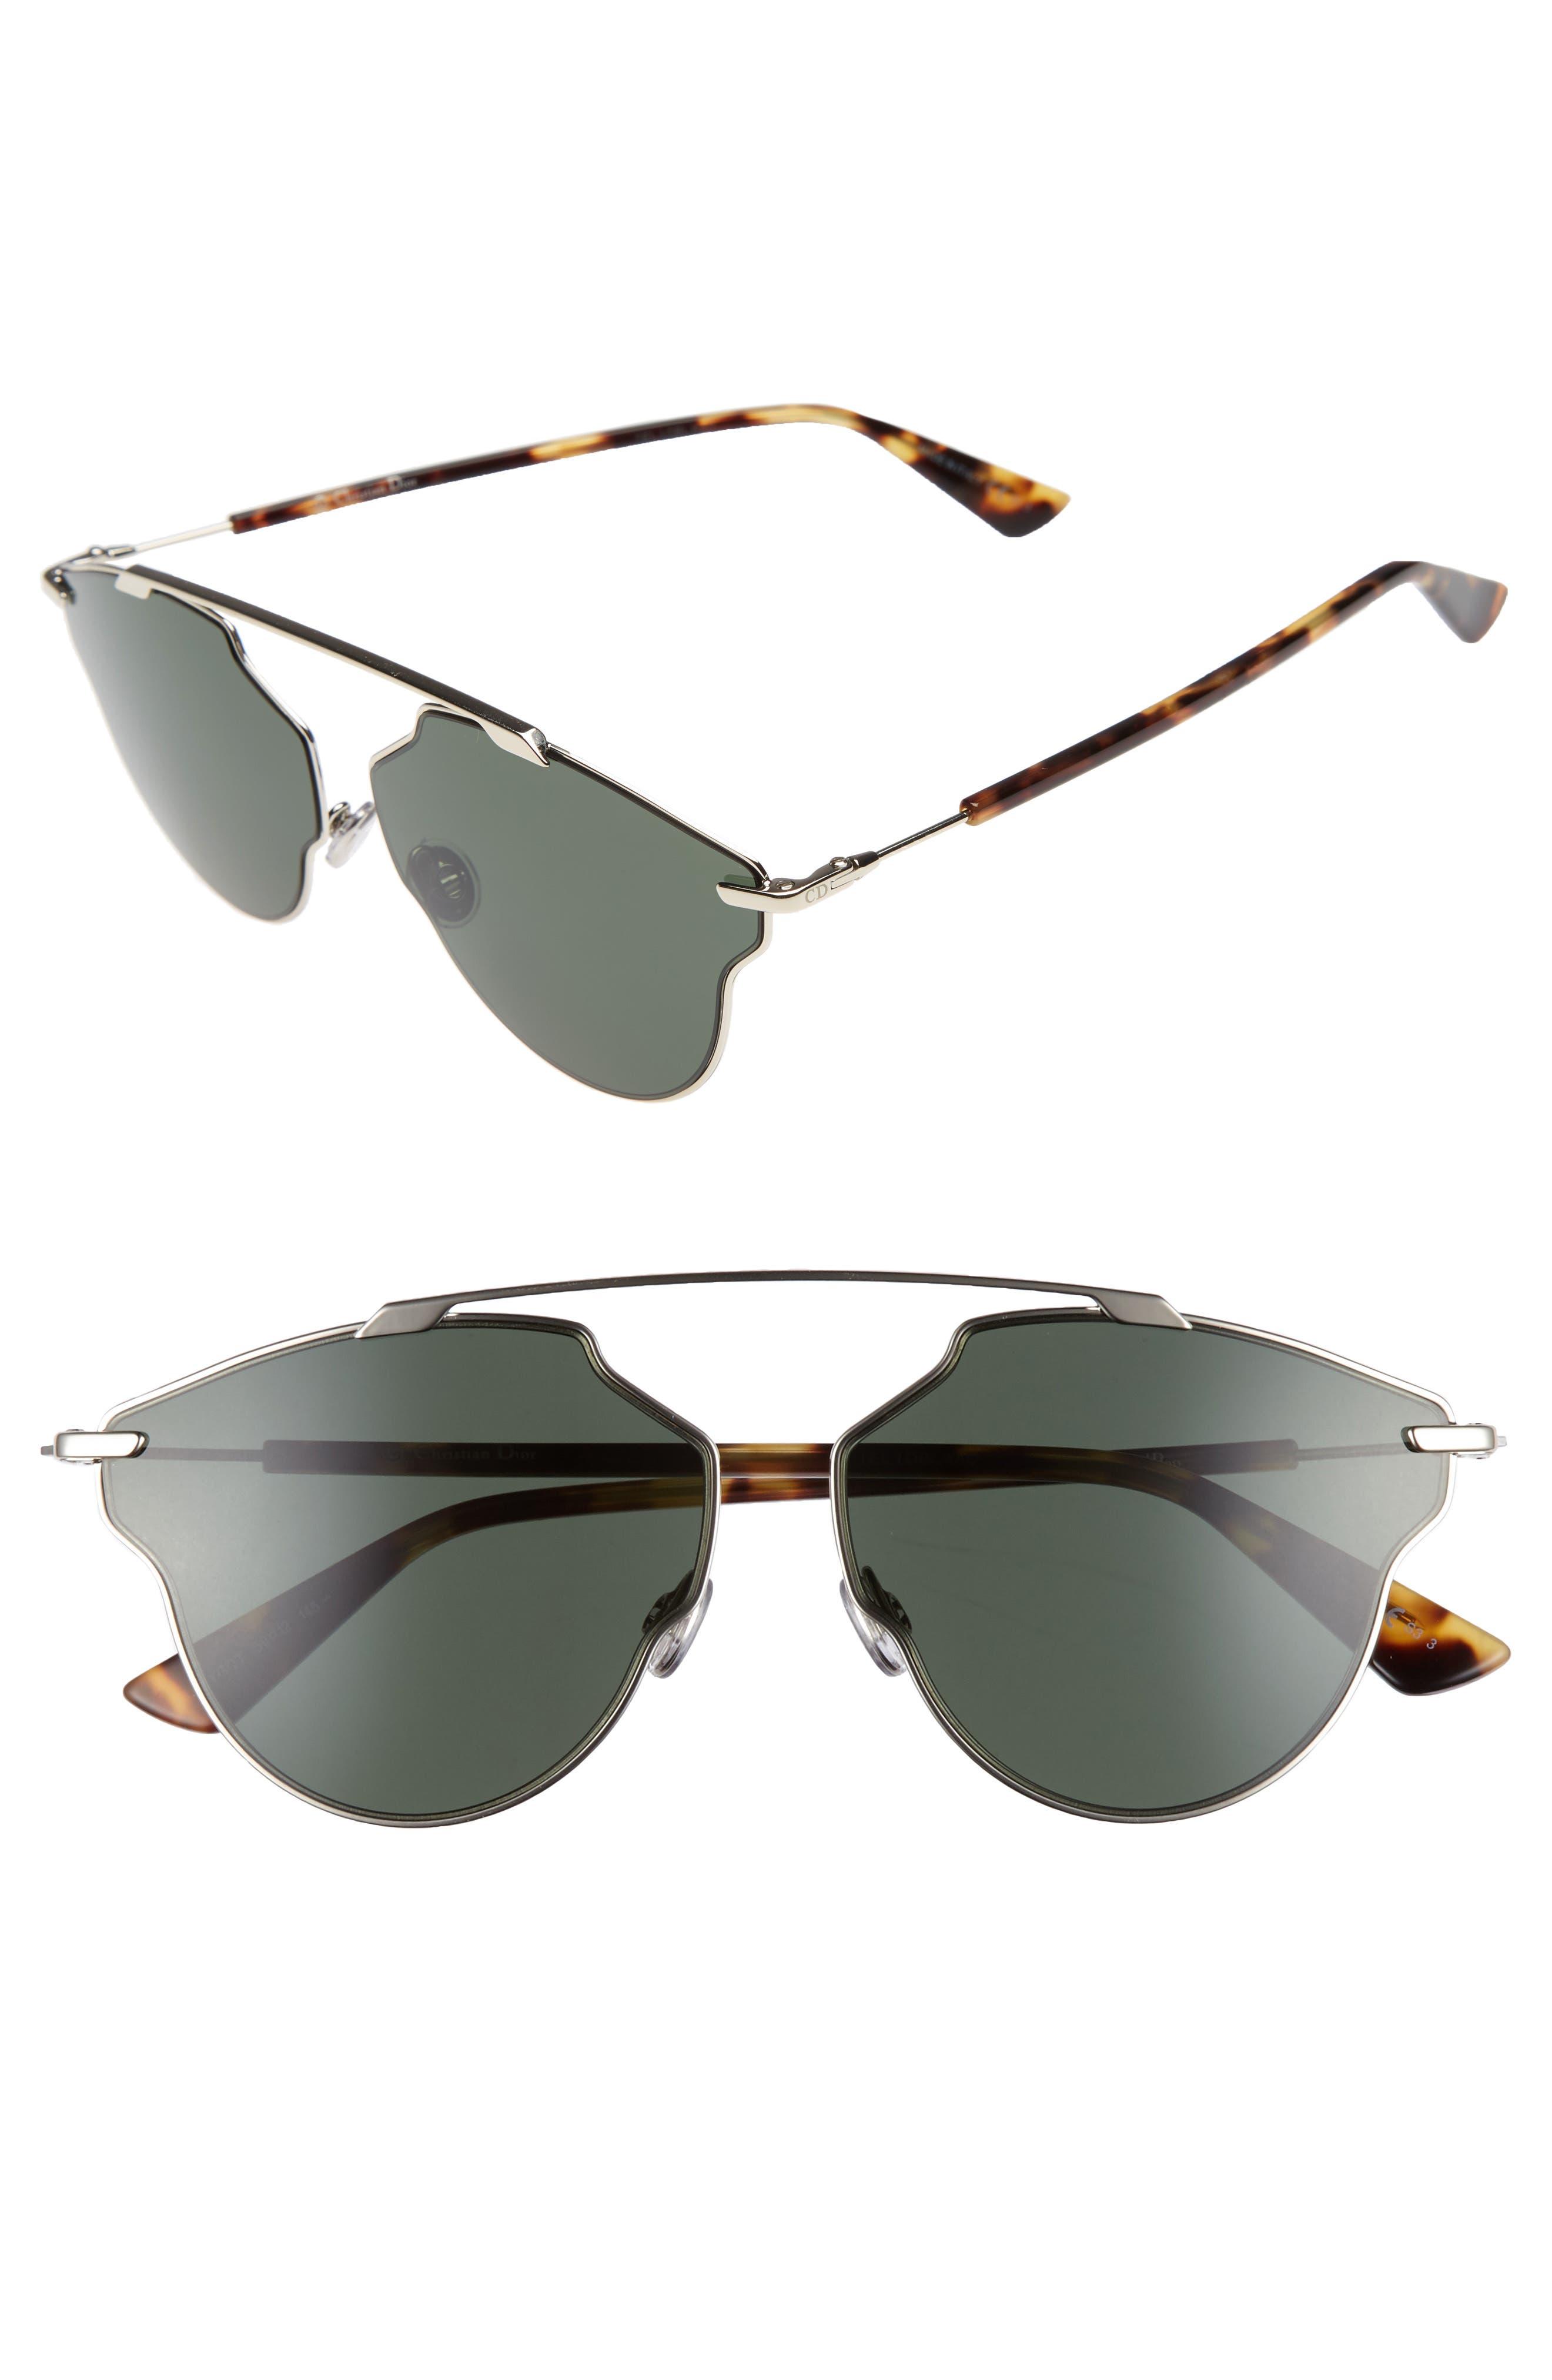 DIOR Christian Dior 448 Dior 59mm Sunglasses